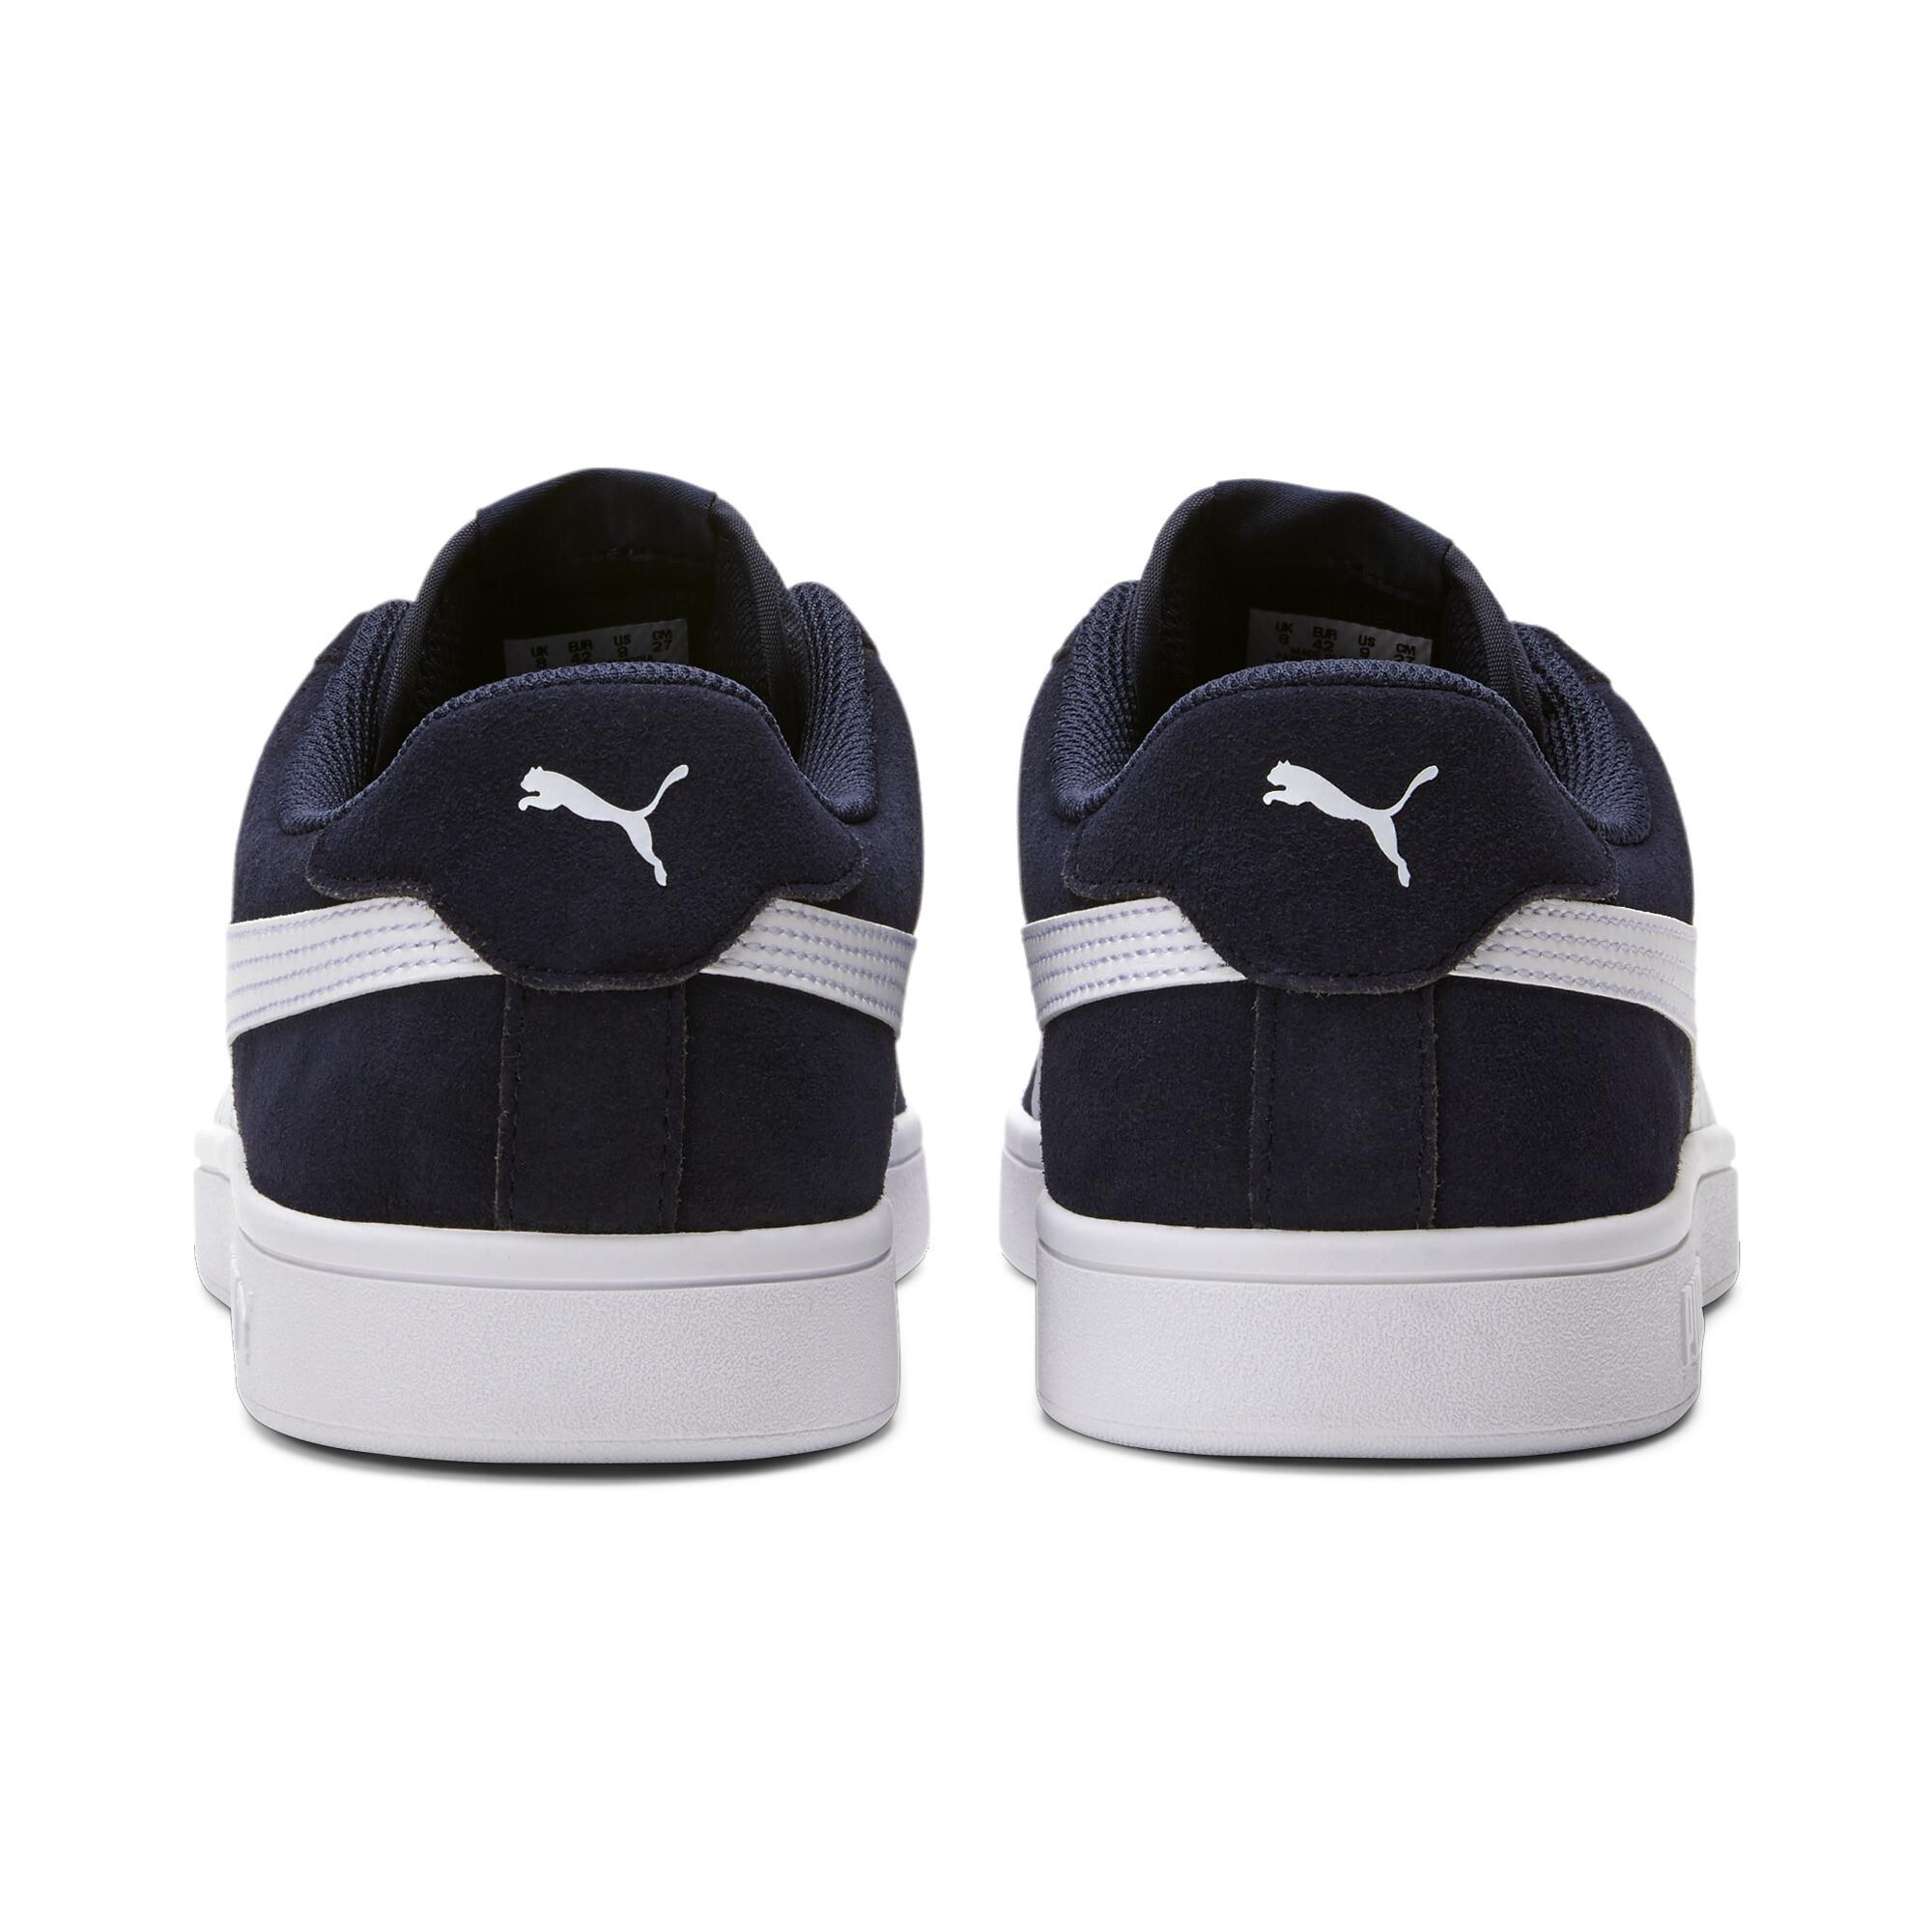 miniature 27 - Puma Men's Smash v2 Sneakers